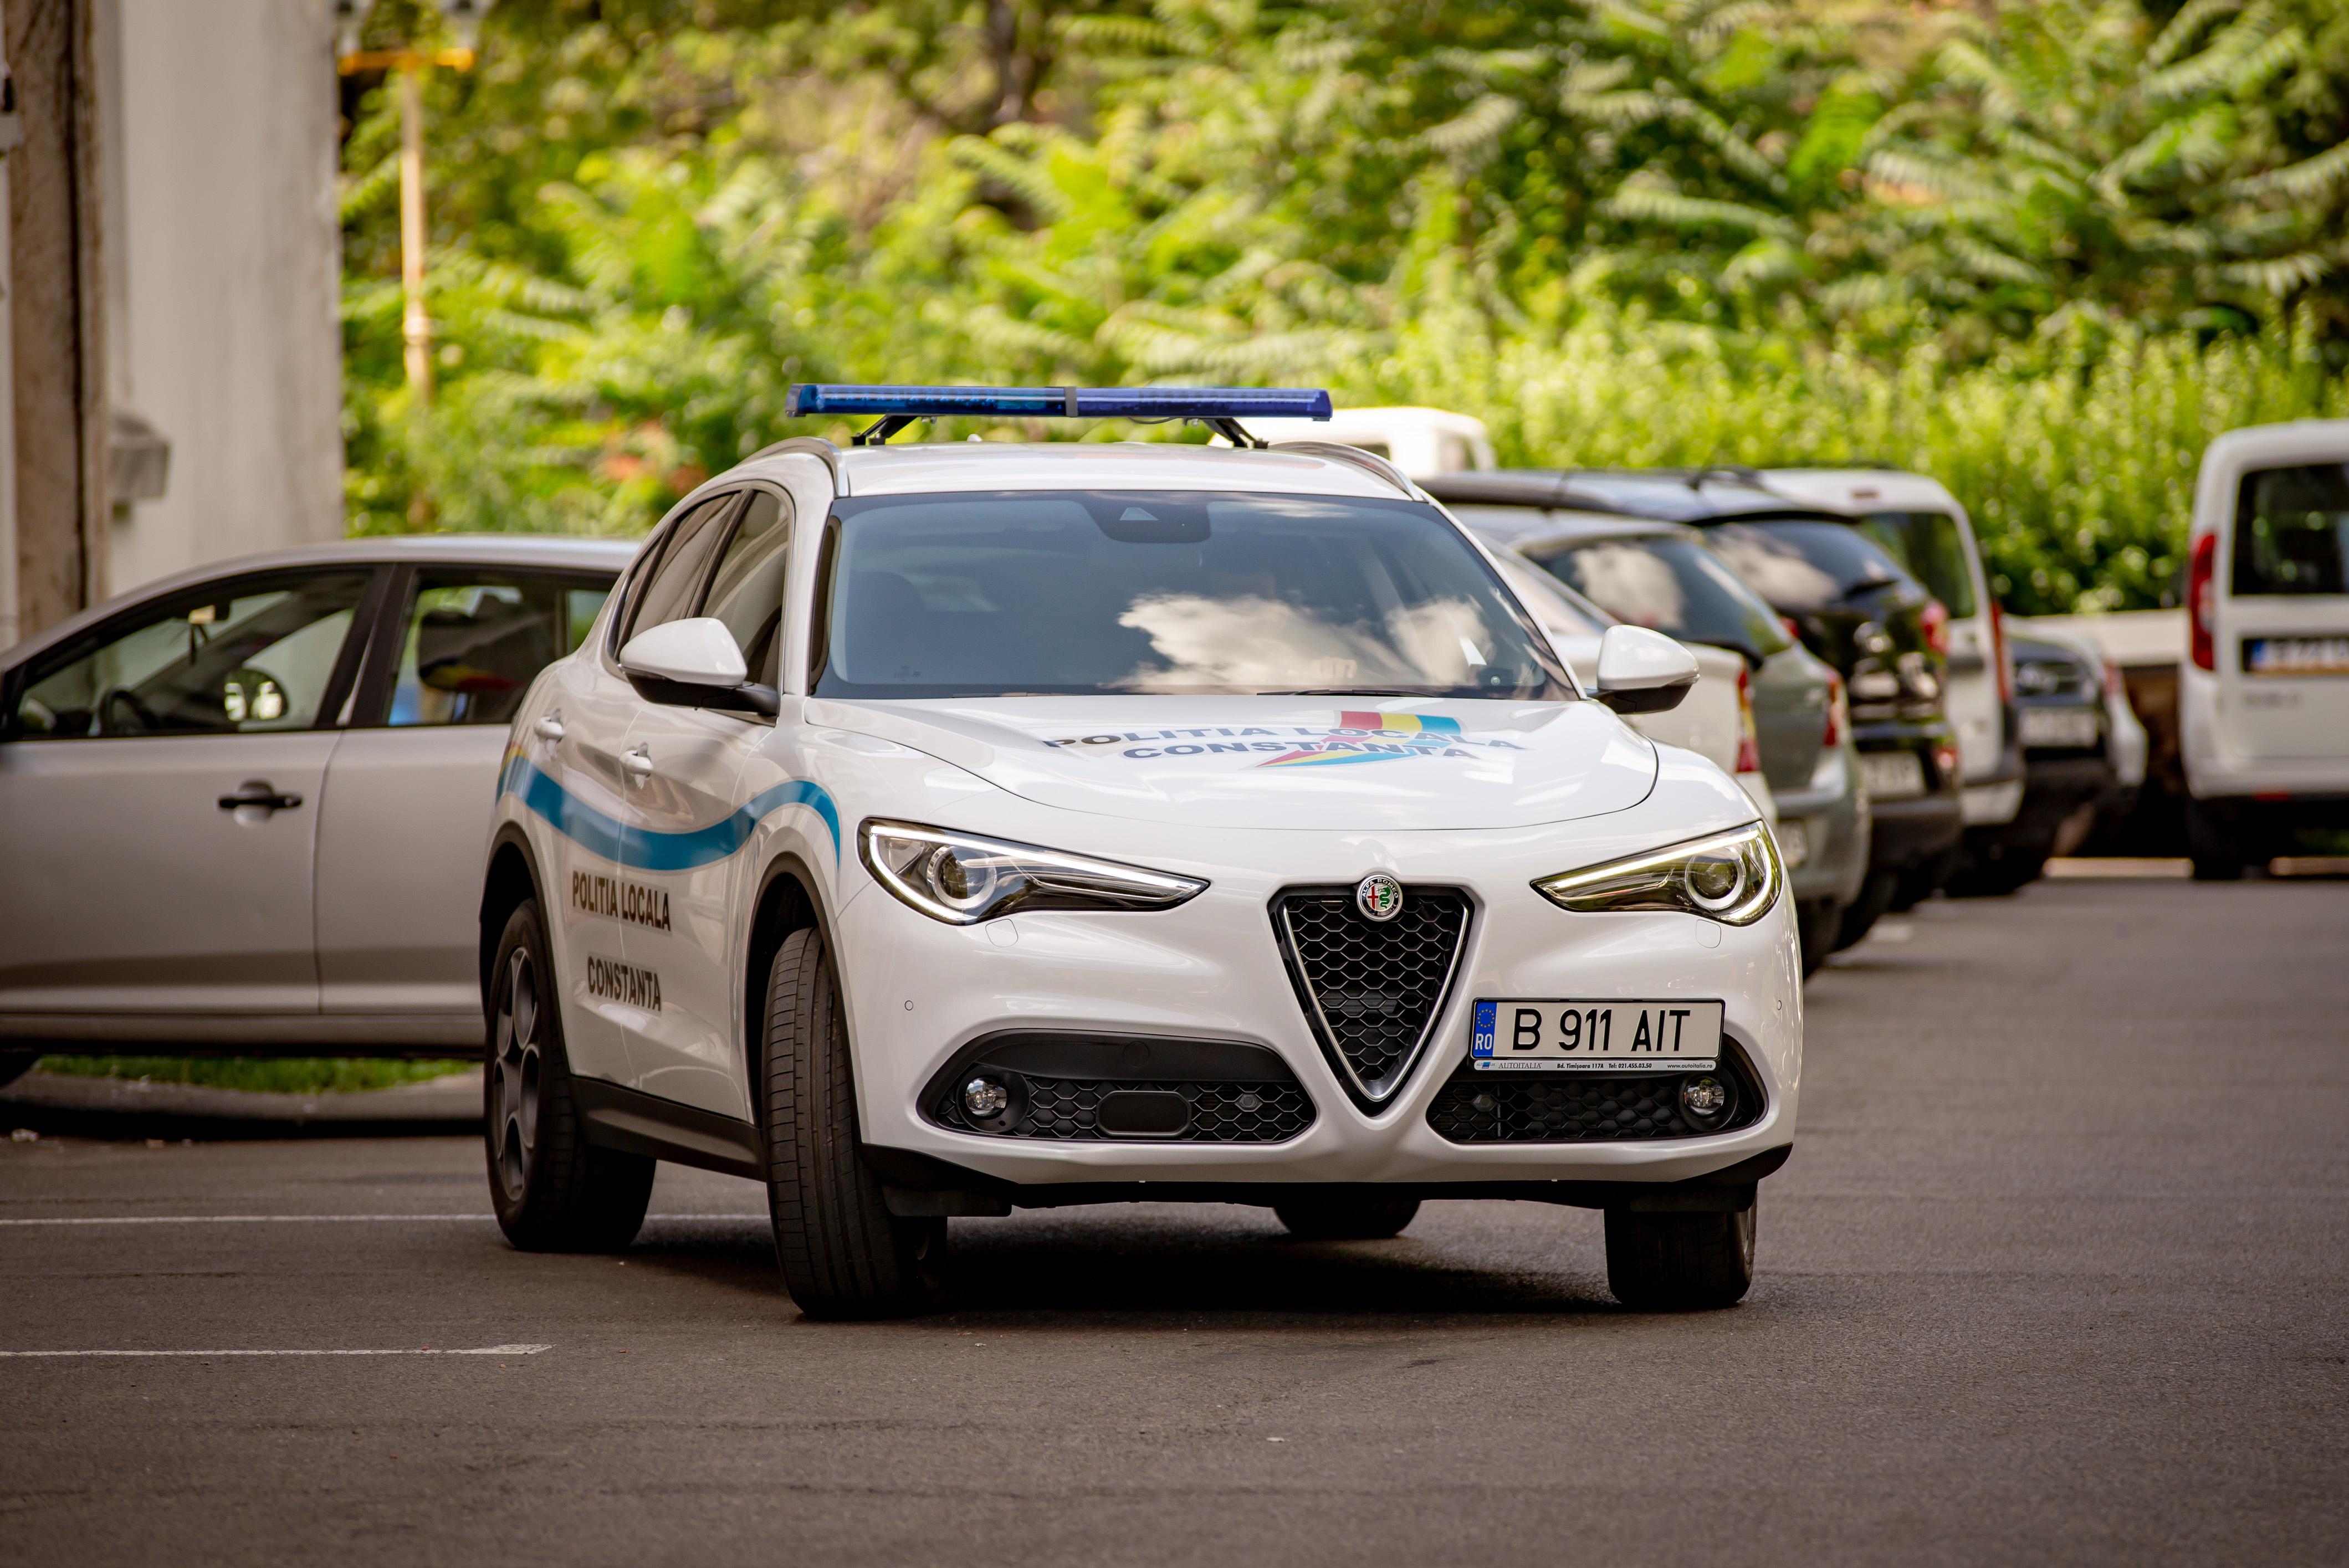 alfa romeo stelvio, now in service of the local police in constanta